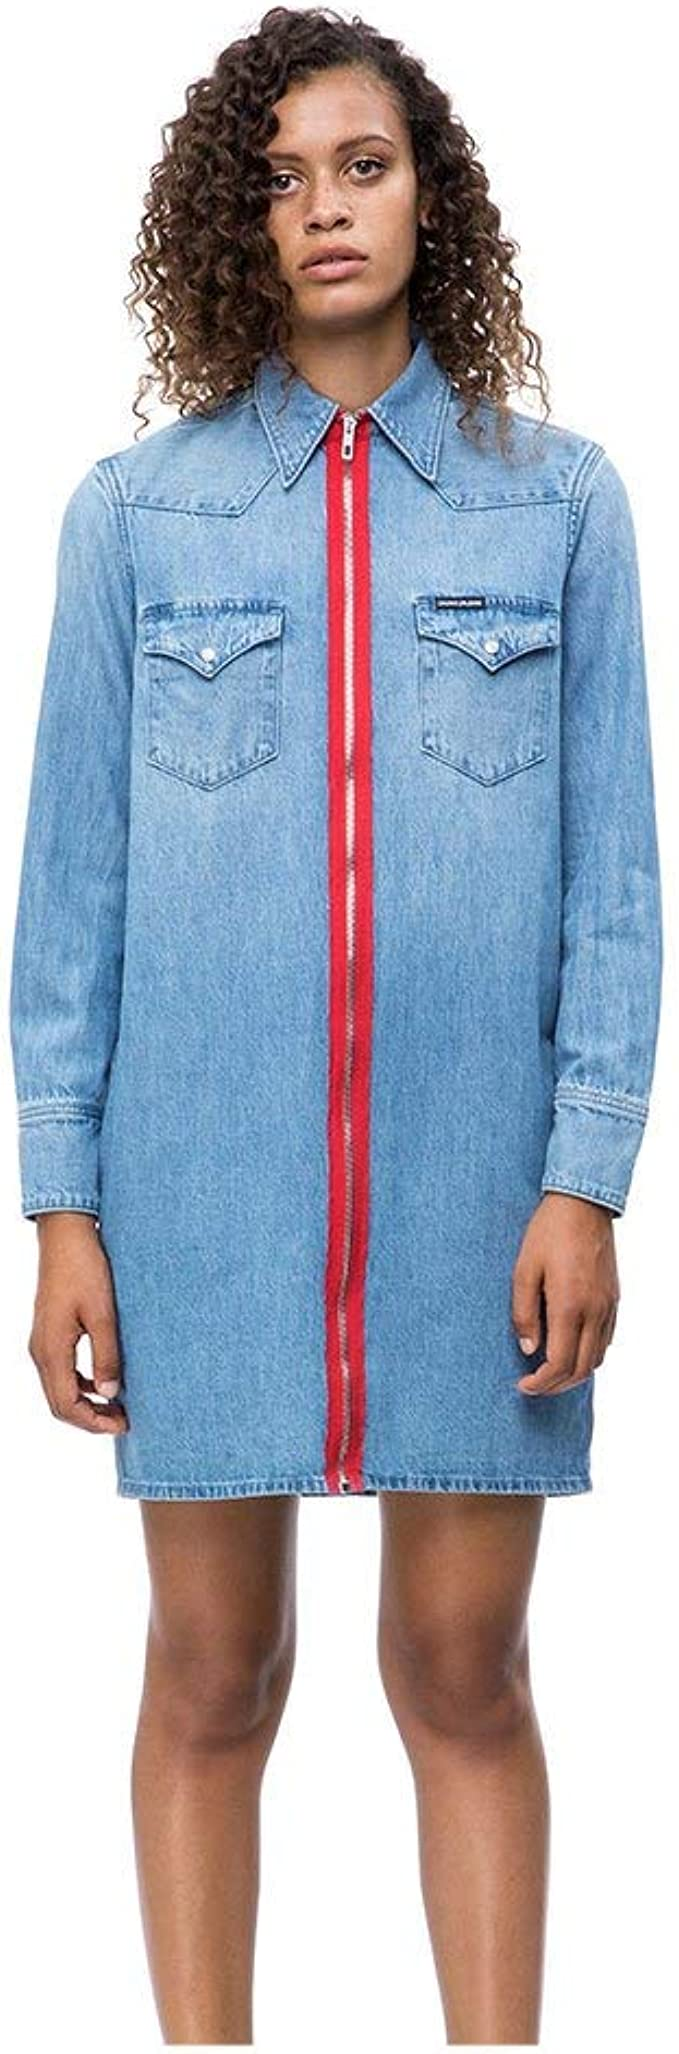 Calvin Klein Jeans Damen Blusenkleid Foundation blauM 20 ...